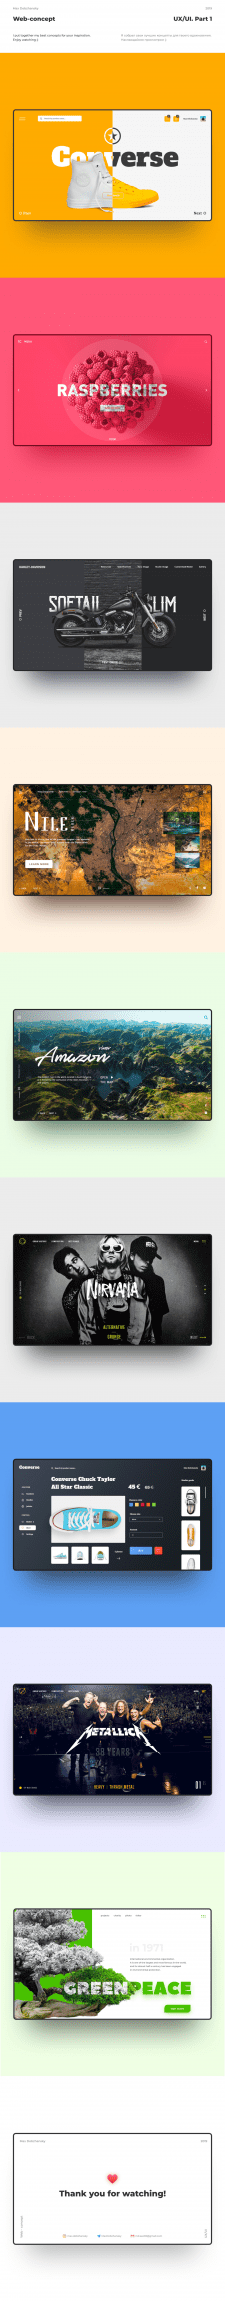 Сборник веб-дизайн концепций